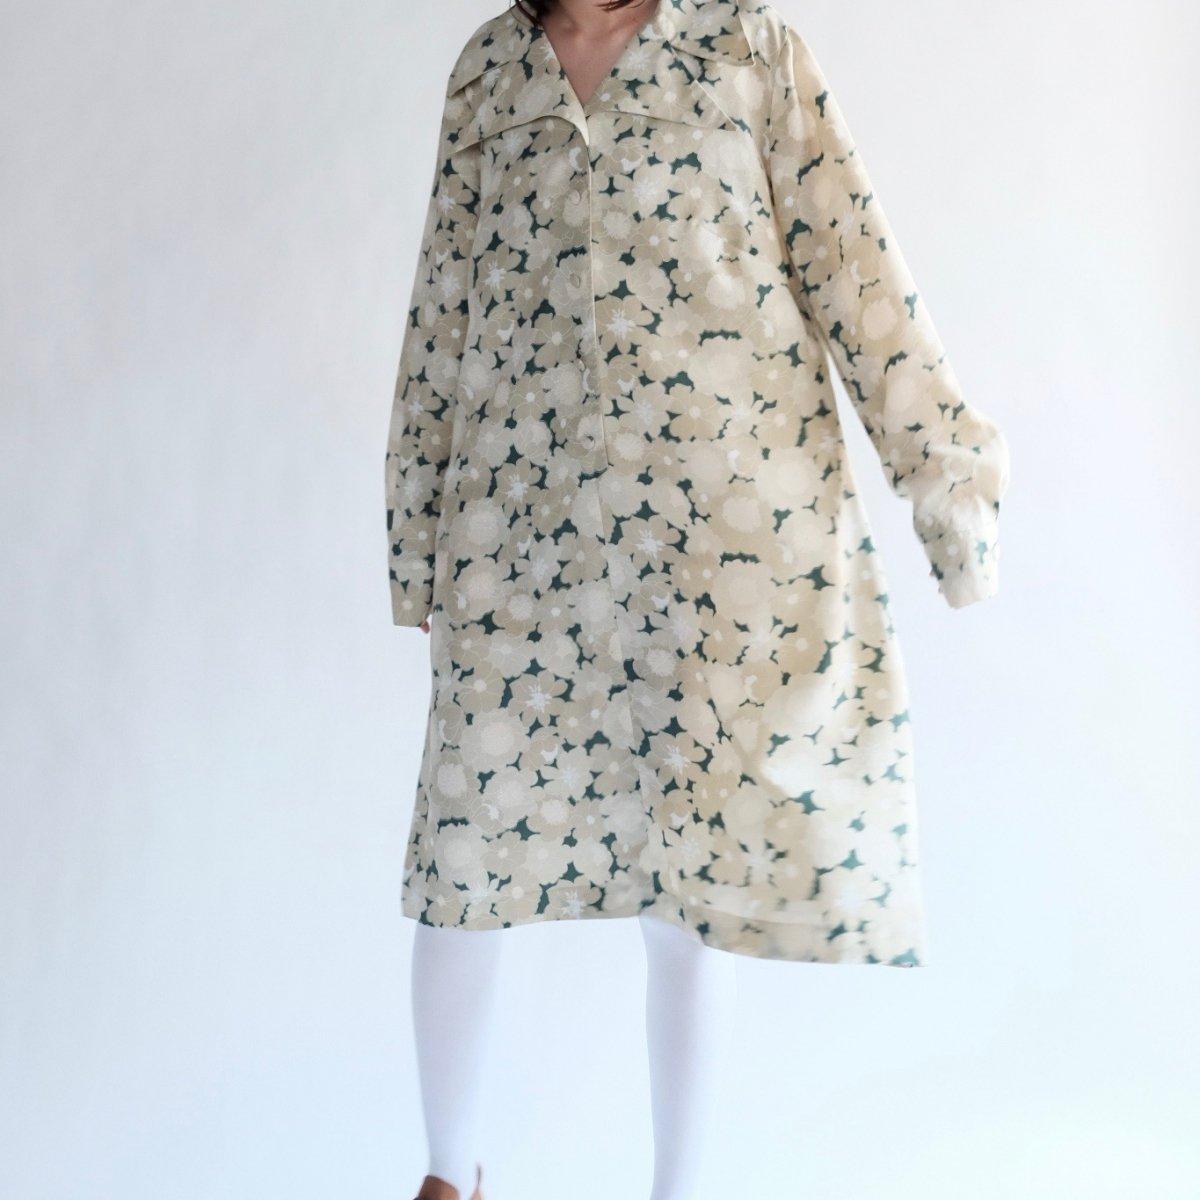 [VINTAGE] Satsuki Tint Dress